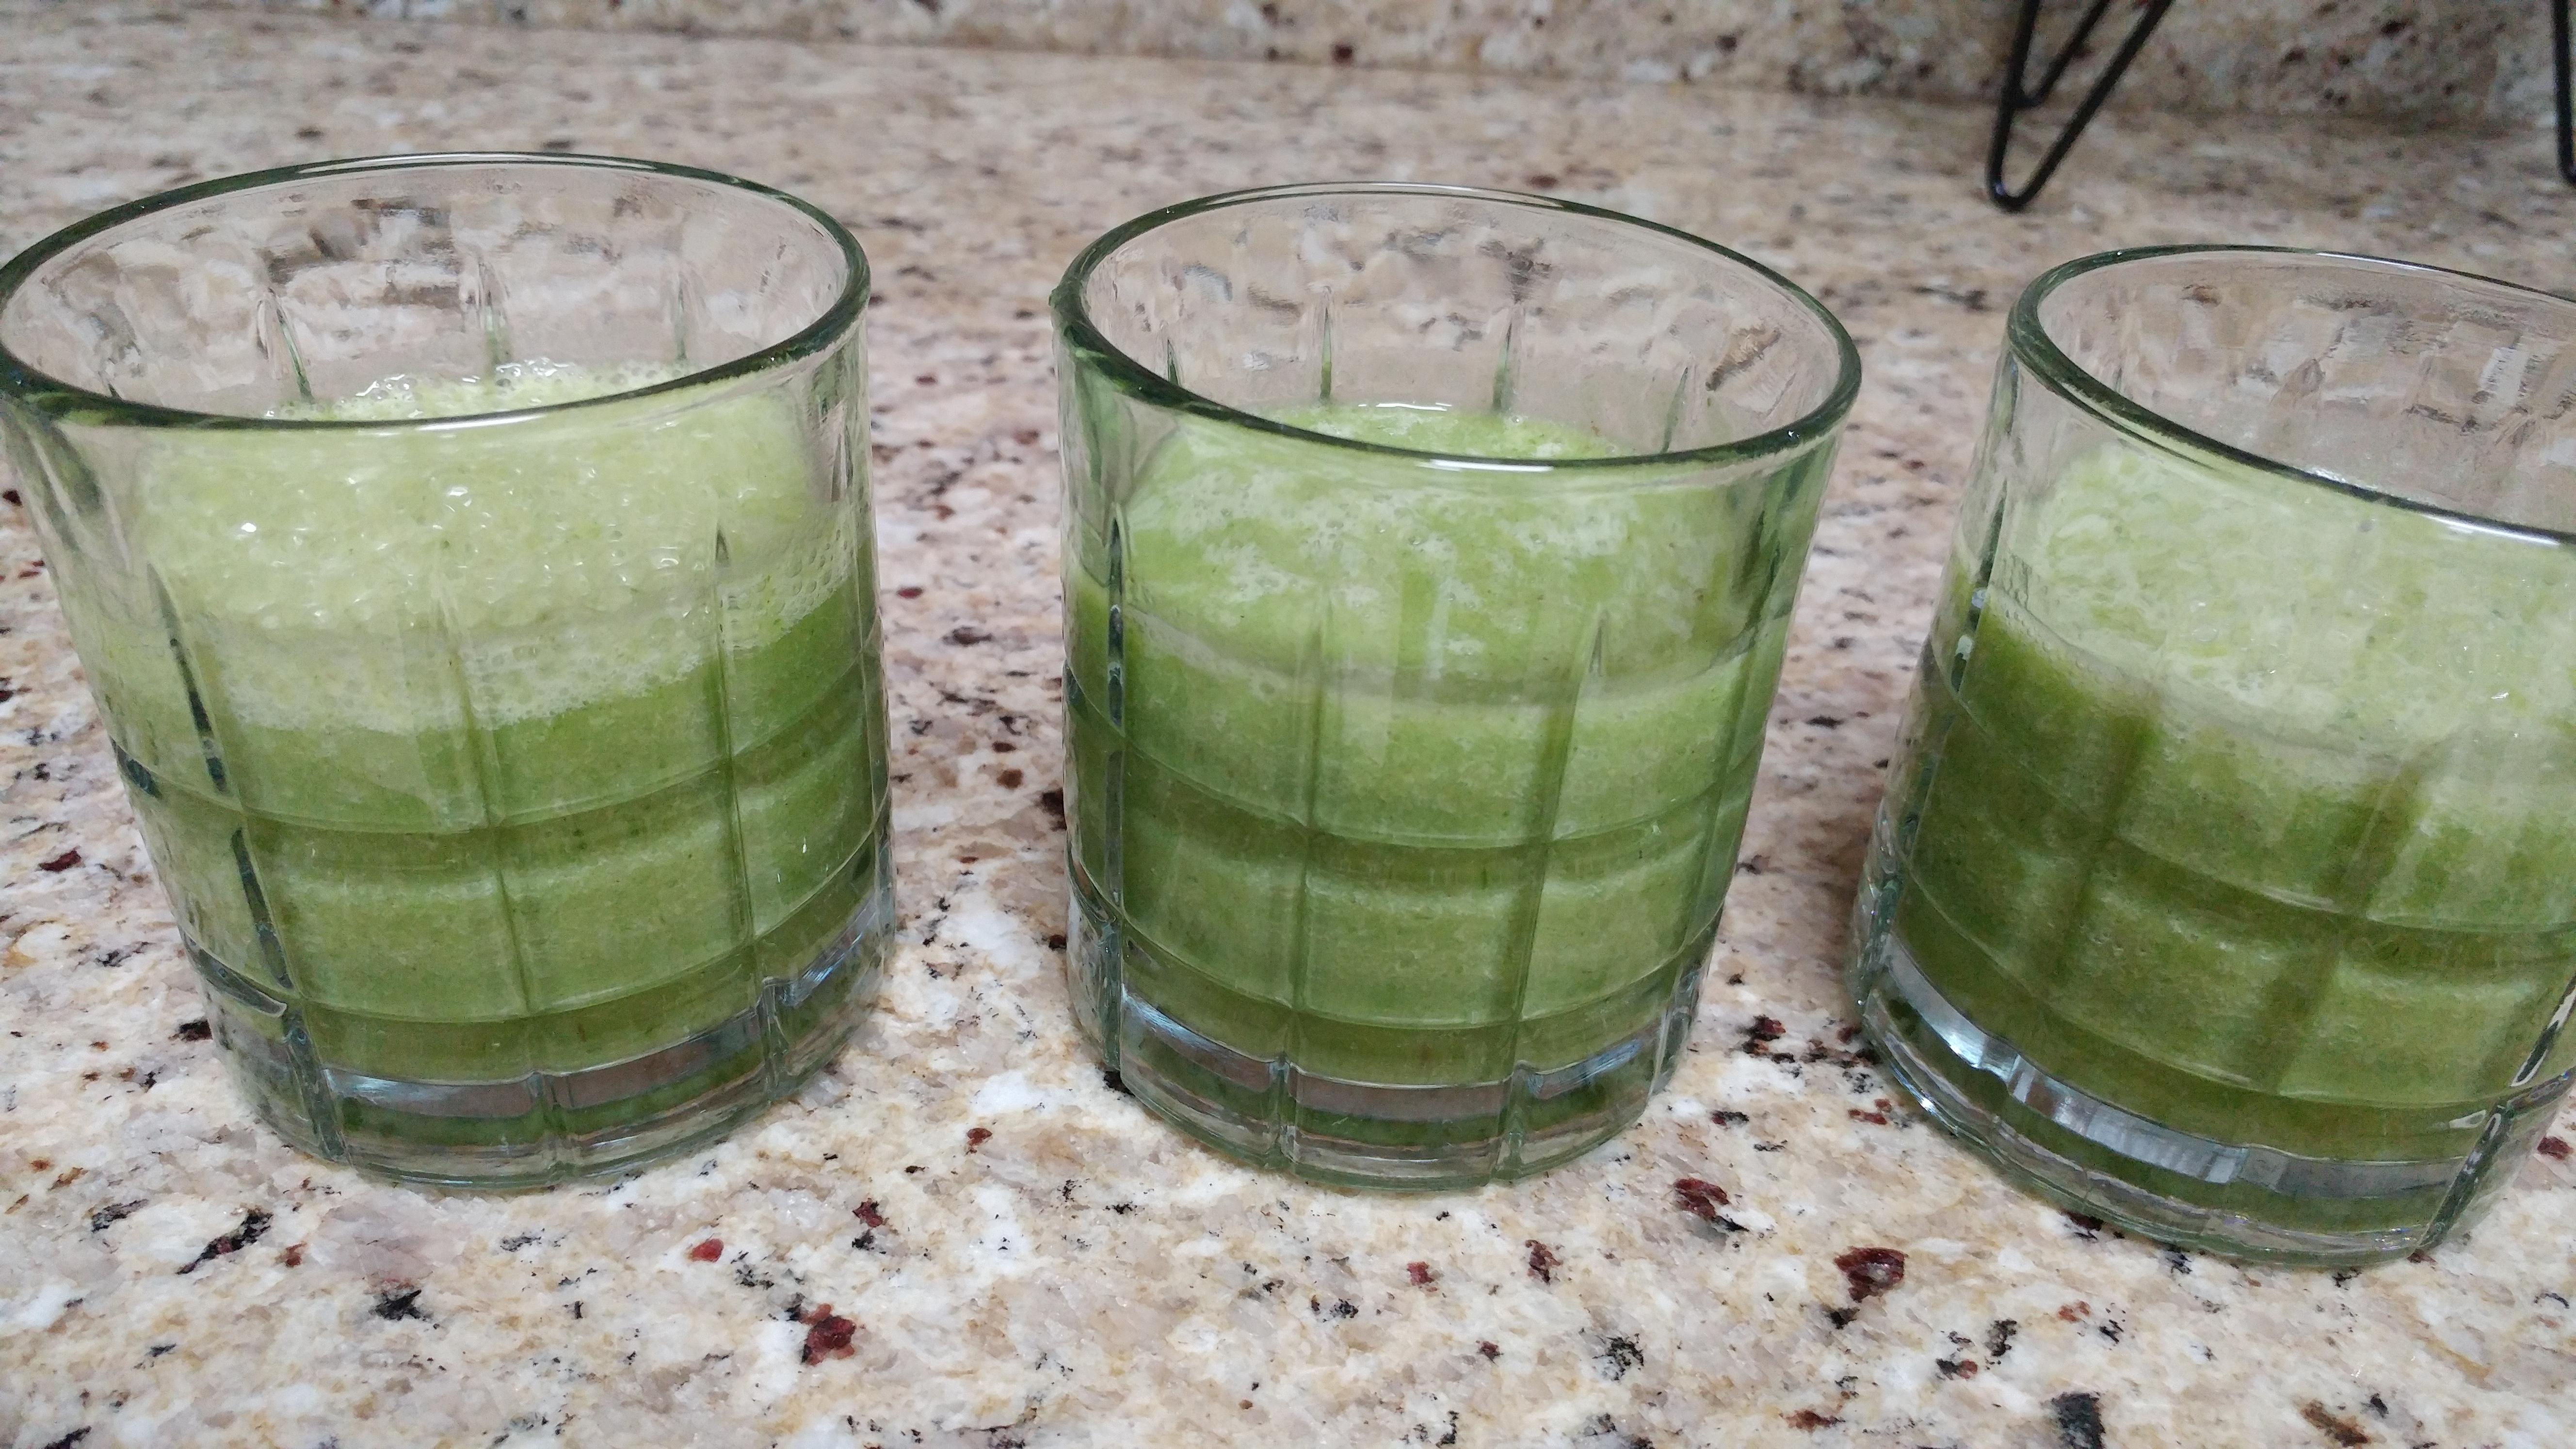 Green smoothies (kale, rice milk, bananas)